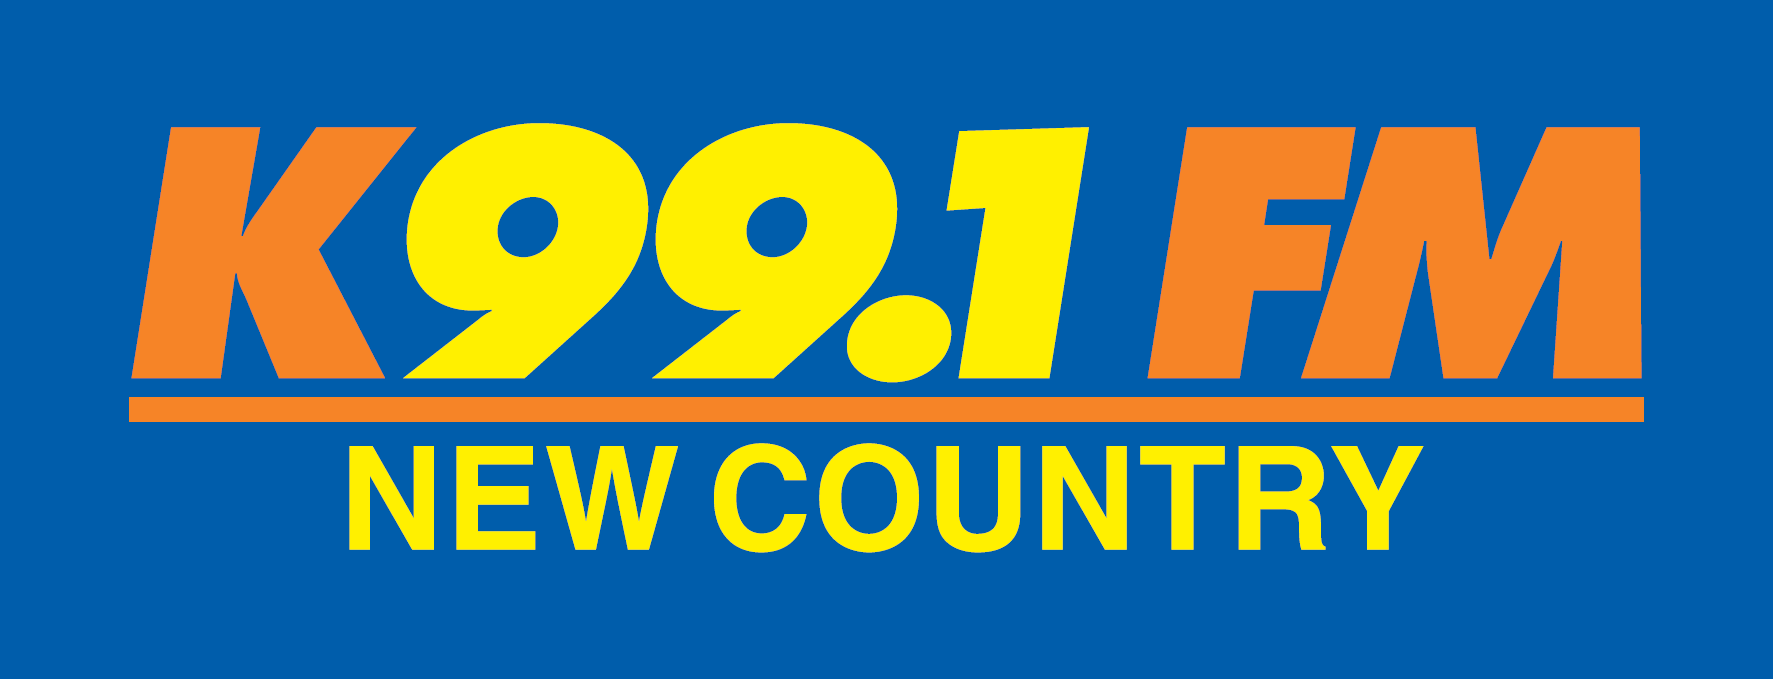 K99.1 FM